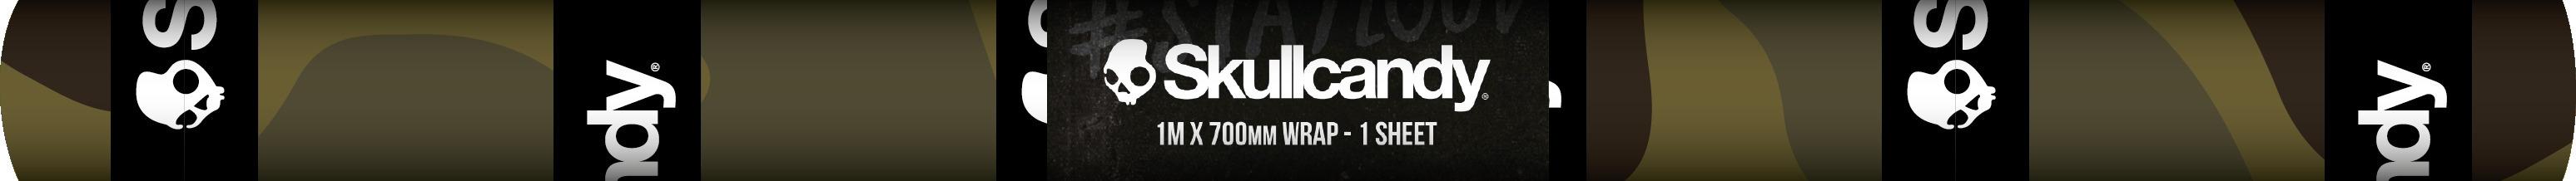 Skullcandy Boys - 1m x 700mm Book Cover Wrap - 1 Sheet